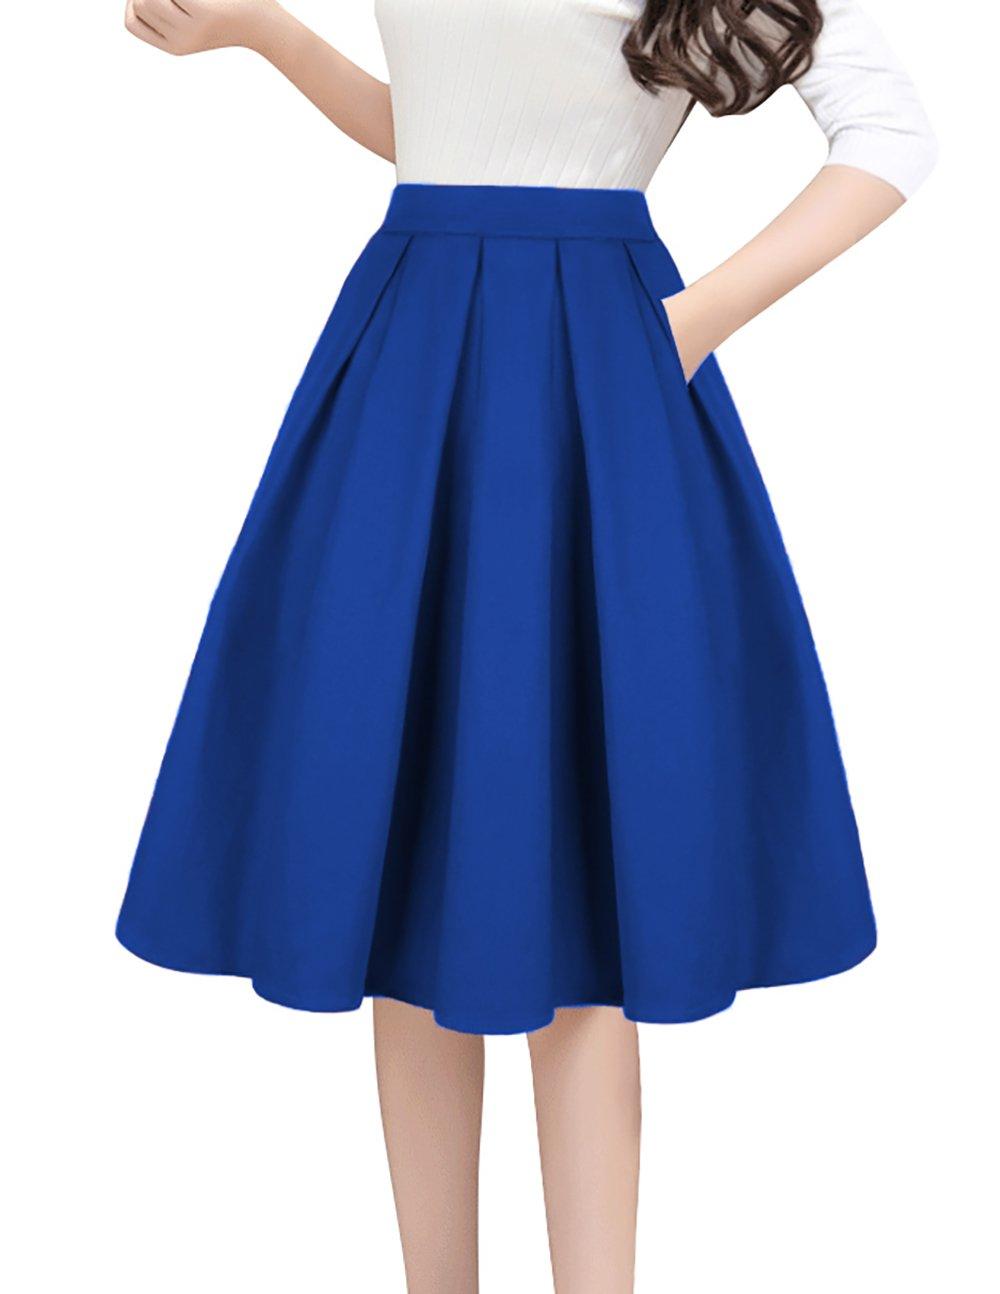 Tandisk Women's High Waist Flared Skirt Pleated Midi Skirt with Pocket Blue S